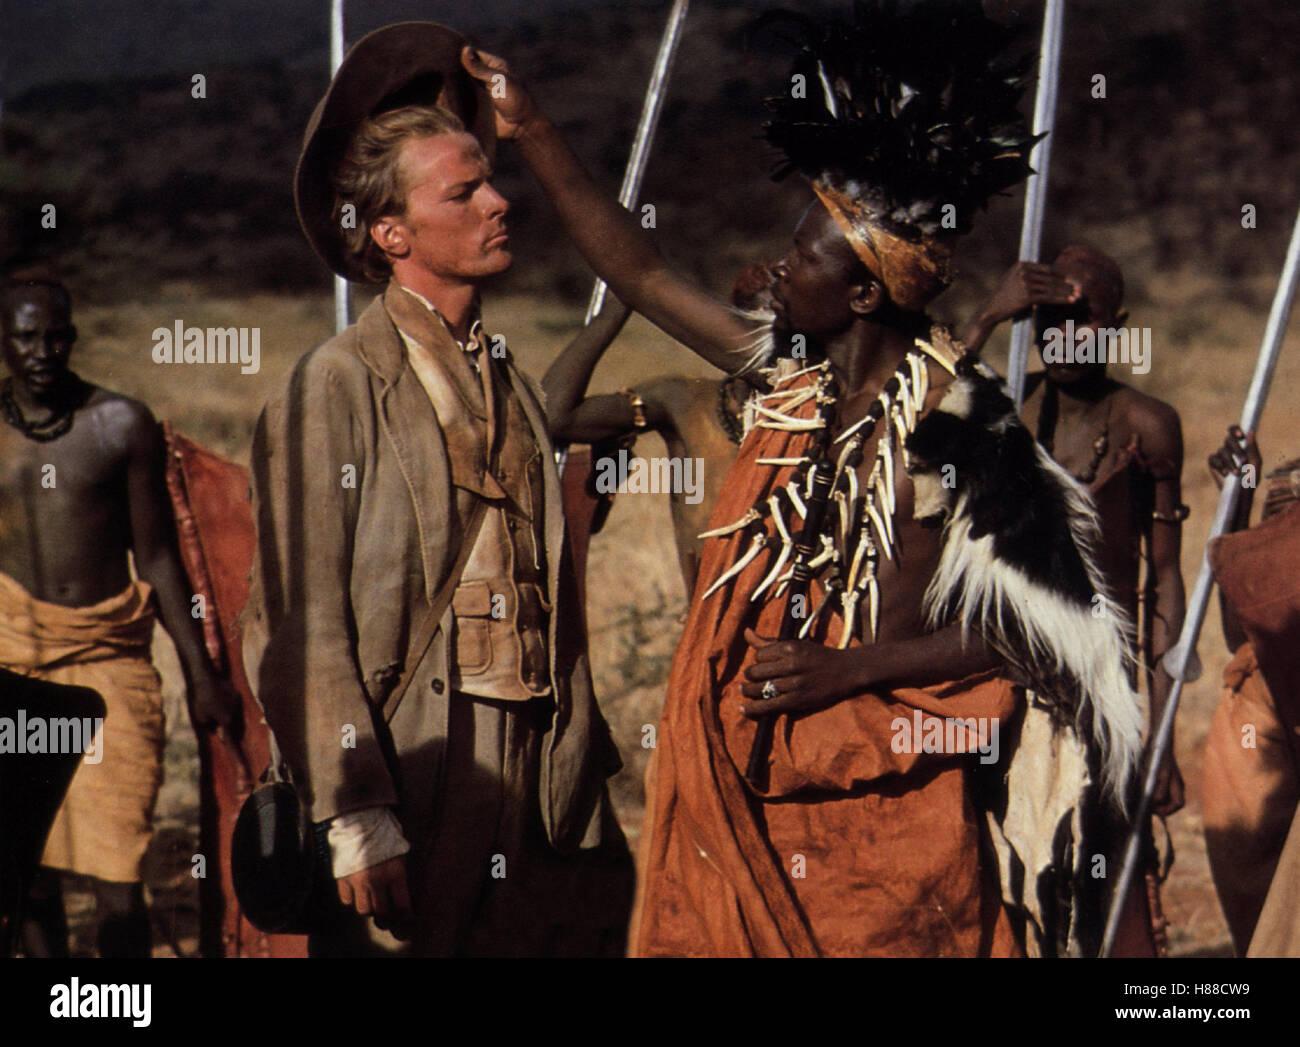 Land der schwarzen Sonne, (MOUNTAINS OF THE MOON) USA 1989, Regie: Bob Rafelson, IAIN GLEN (li), Stichwort: Afrika, Stock Photo